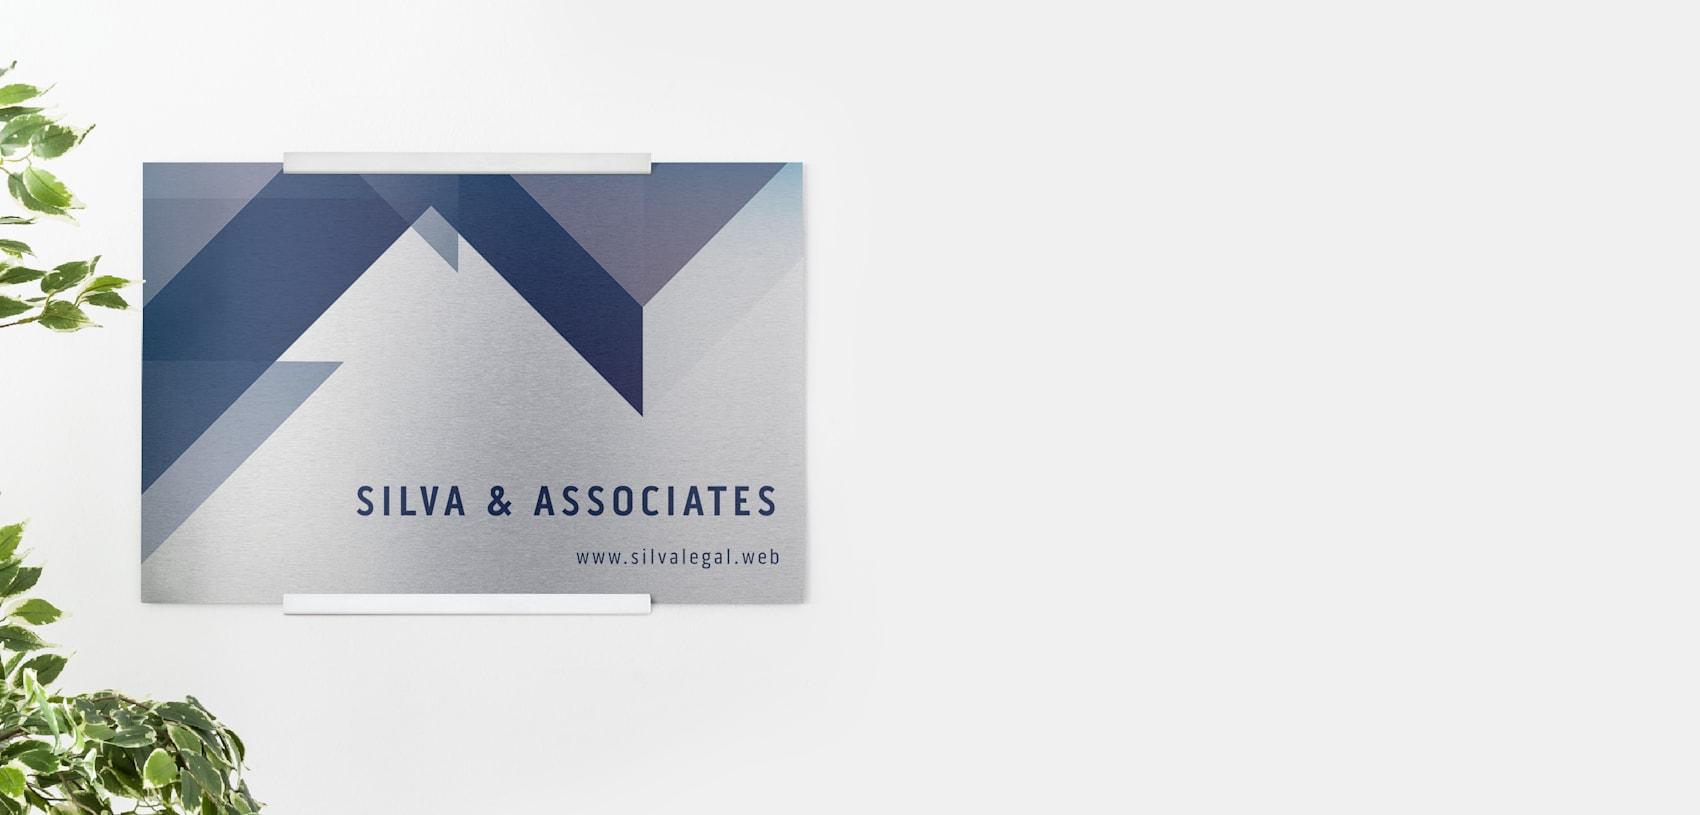 custom grey metal sign for printing